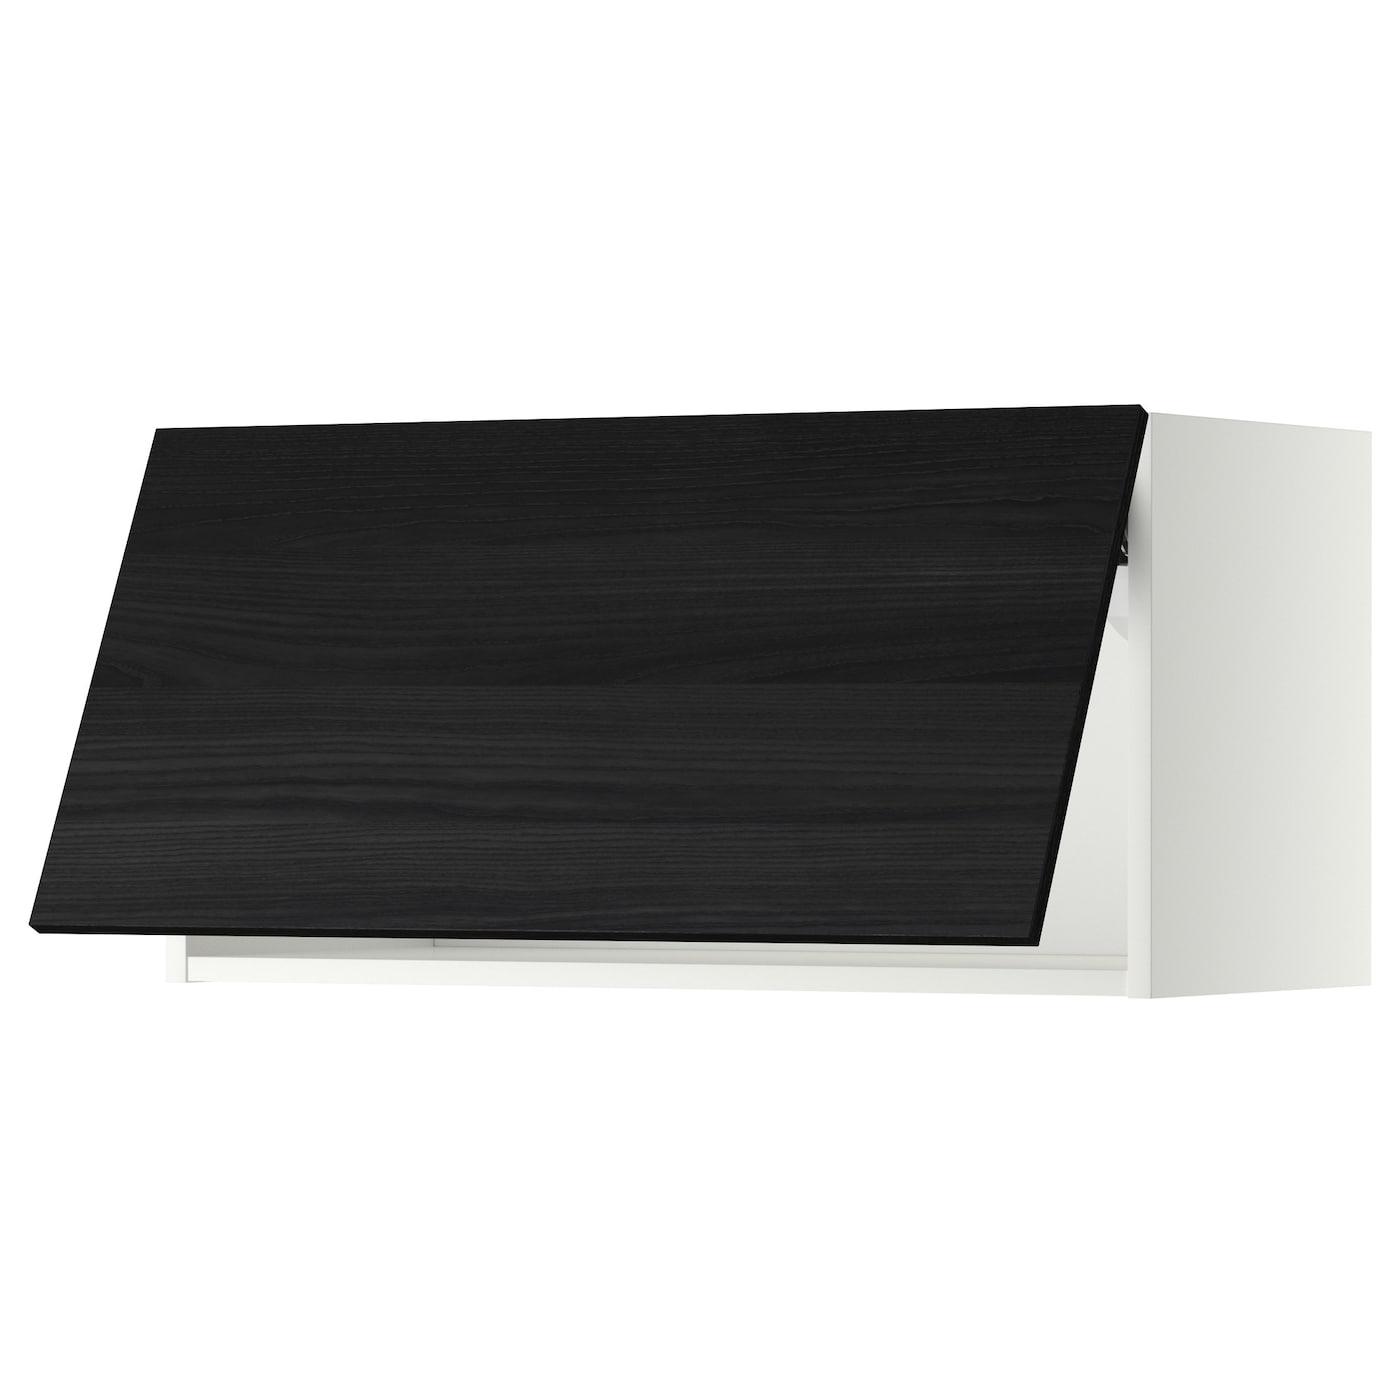 METOD, Wandschrank horizontal, weiß, schwarz 199.181.33